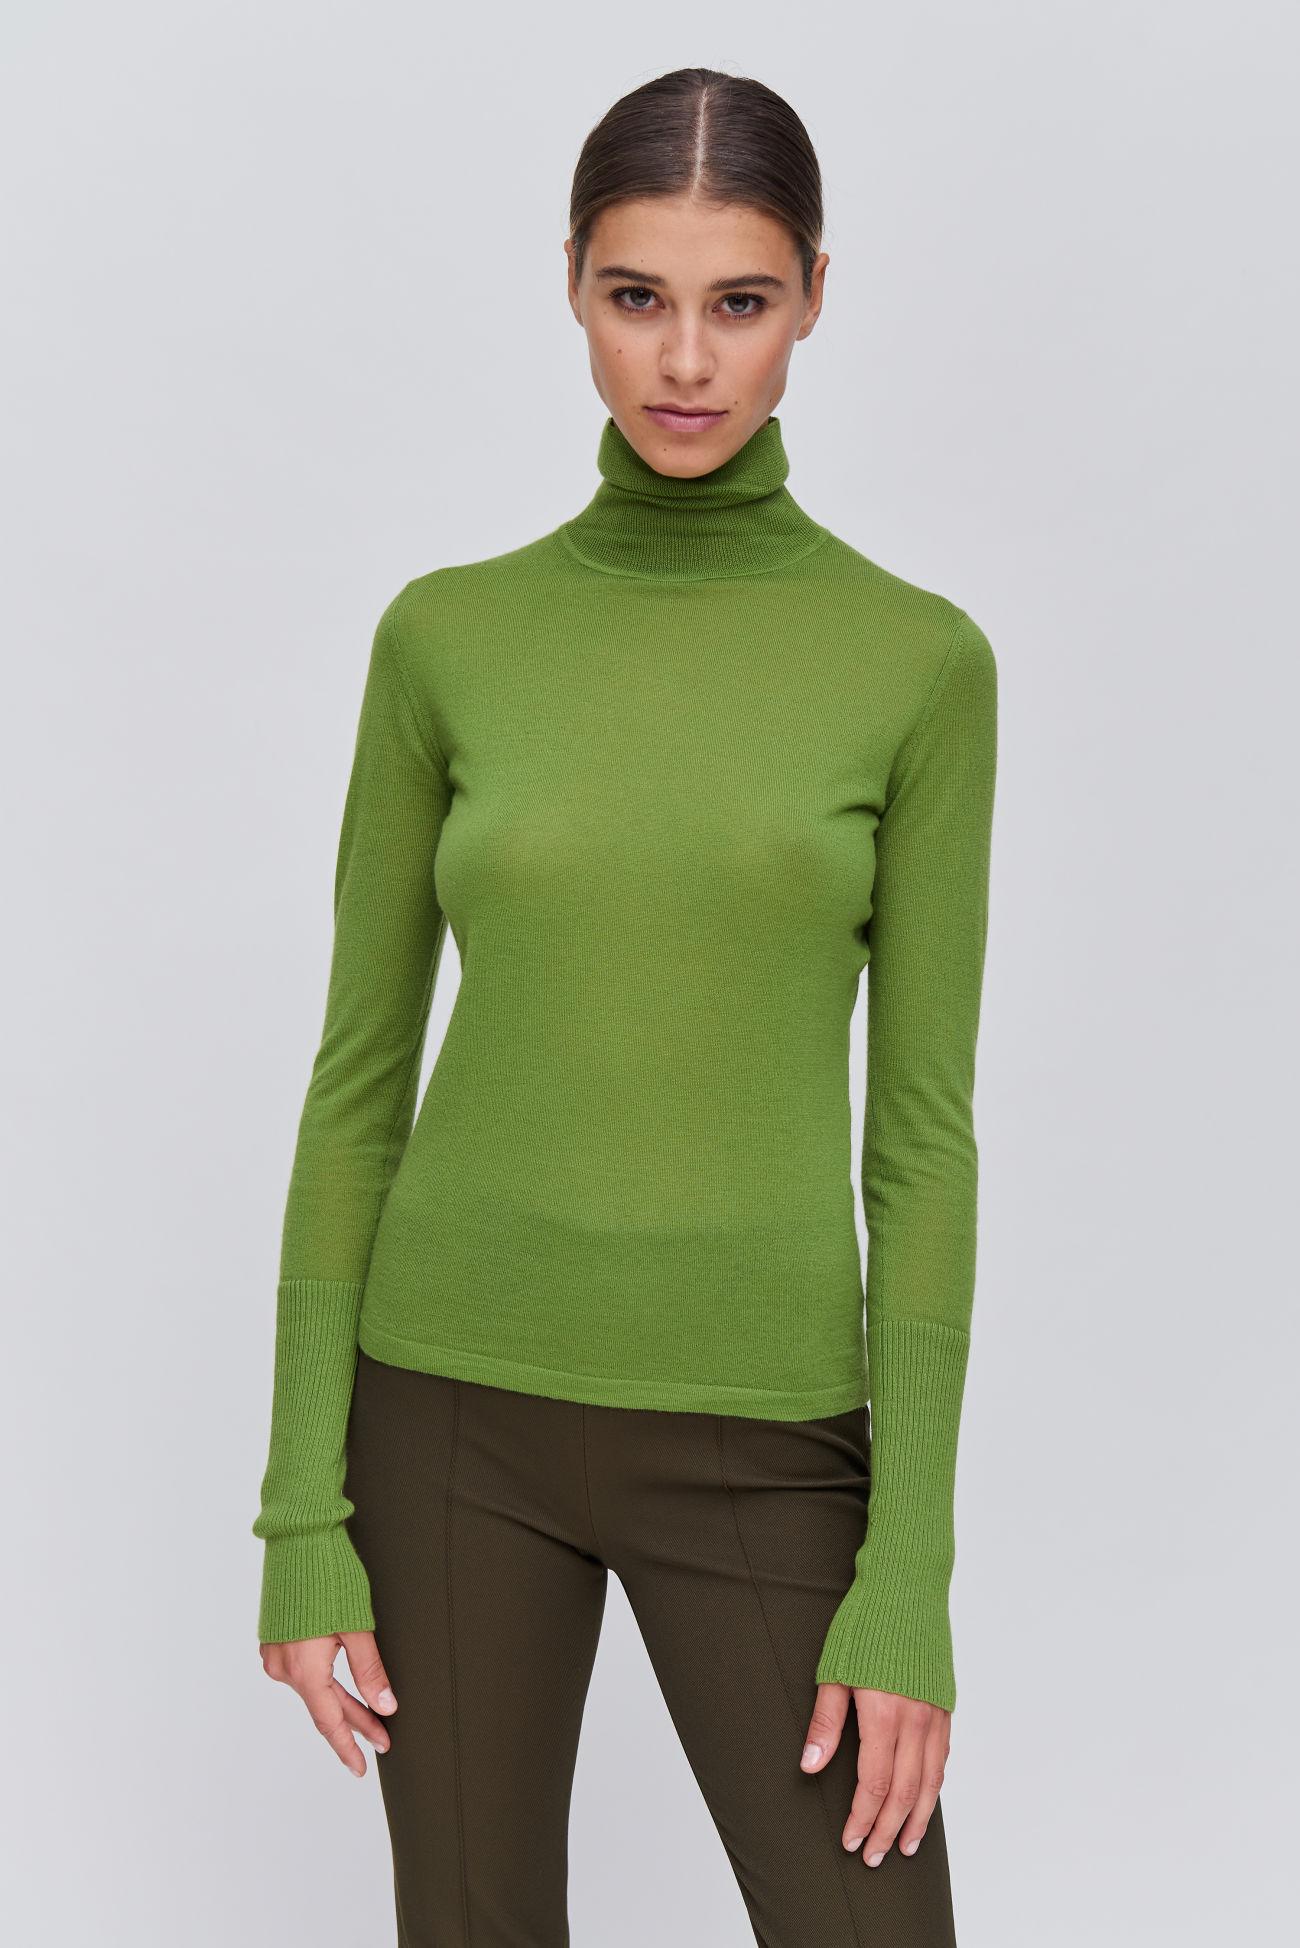 Babycashmere sweater